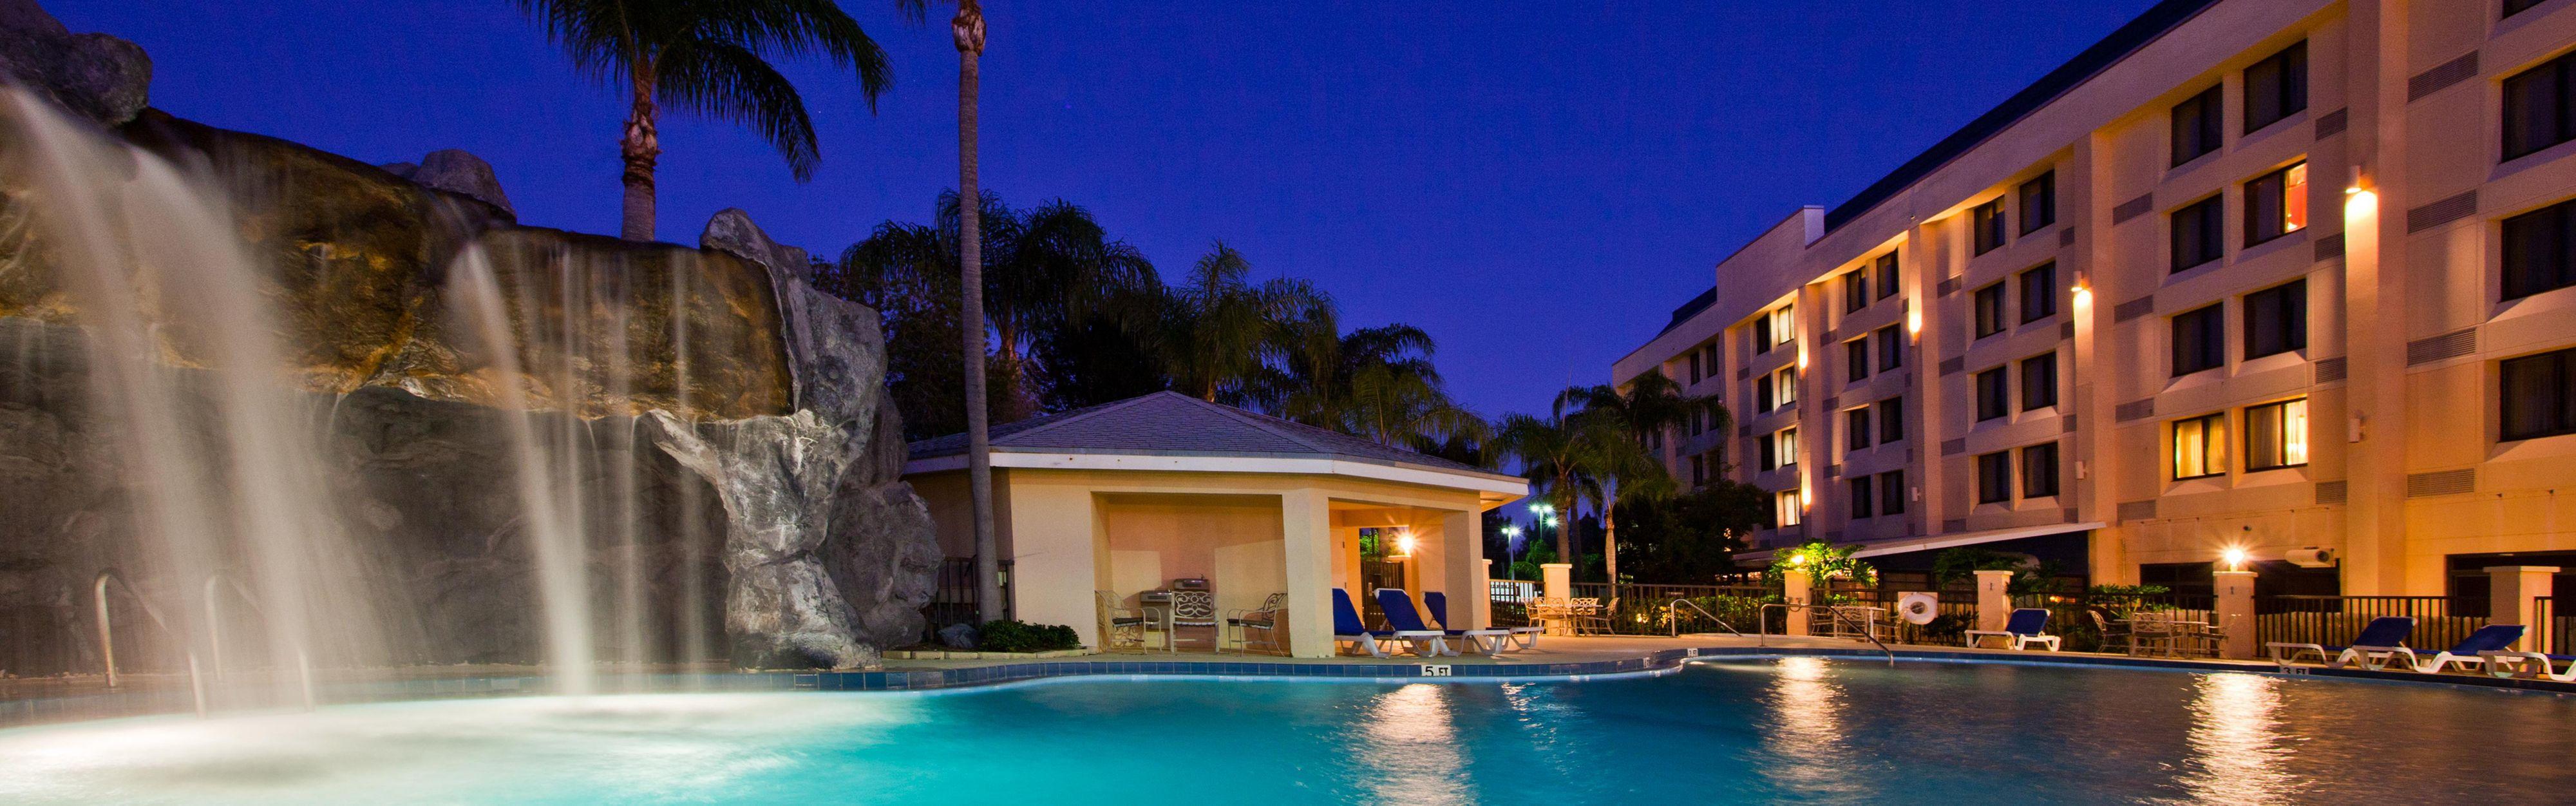 Holiday Inn Port St. Lucie image 0